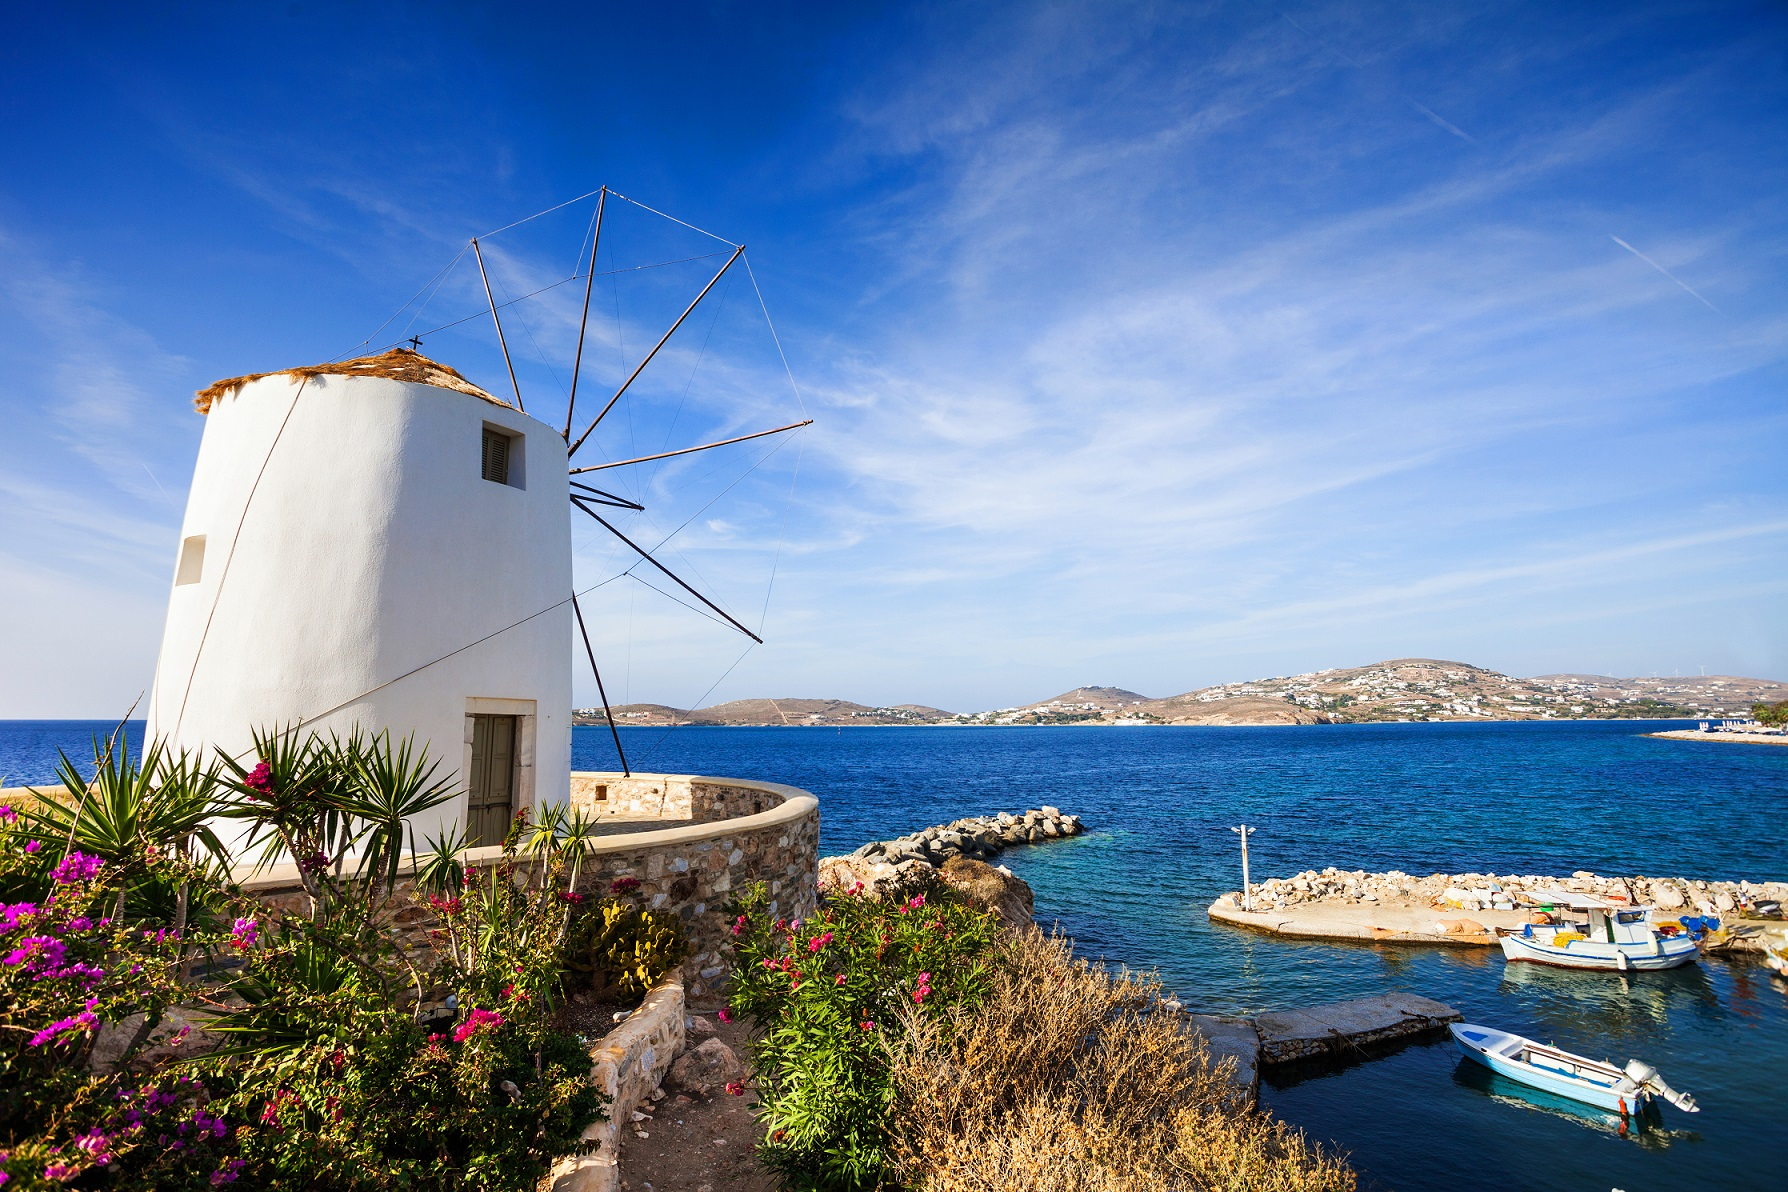 Greece-Cyclades-Islands-Paros-Parikia